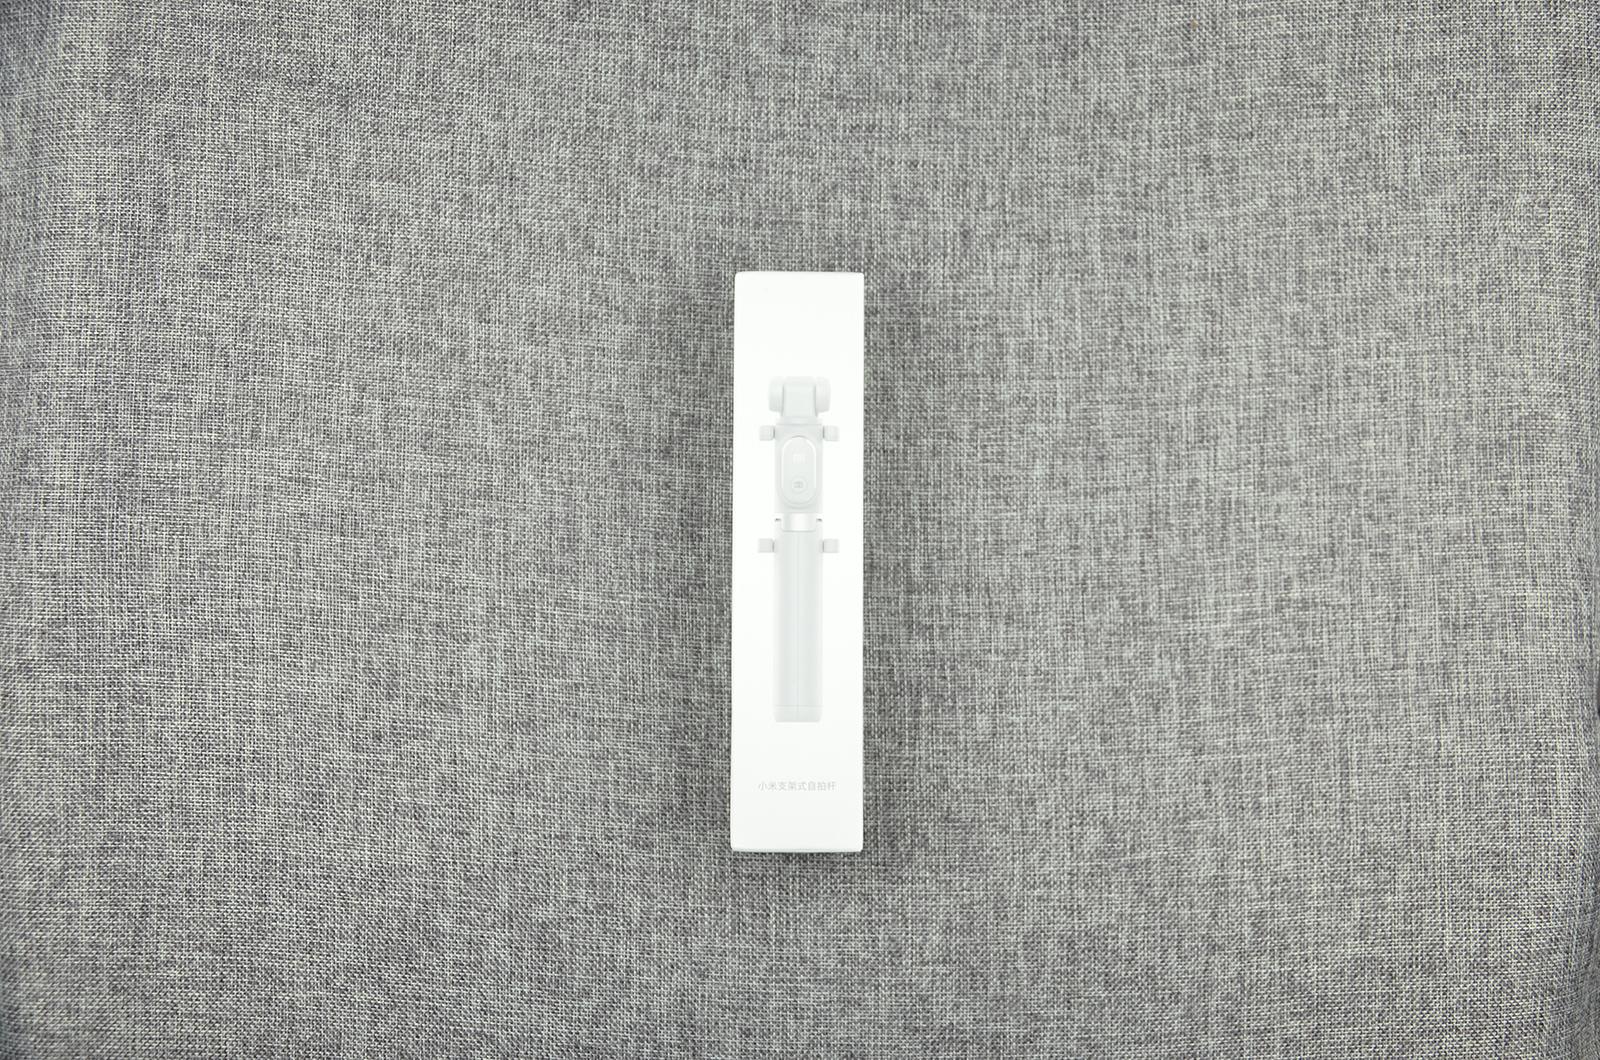 Mi Selfie Stick Tripod: обзор нового монопода от Xiaomi